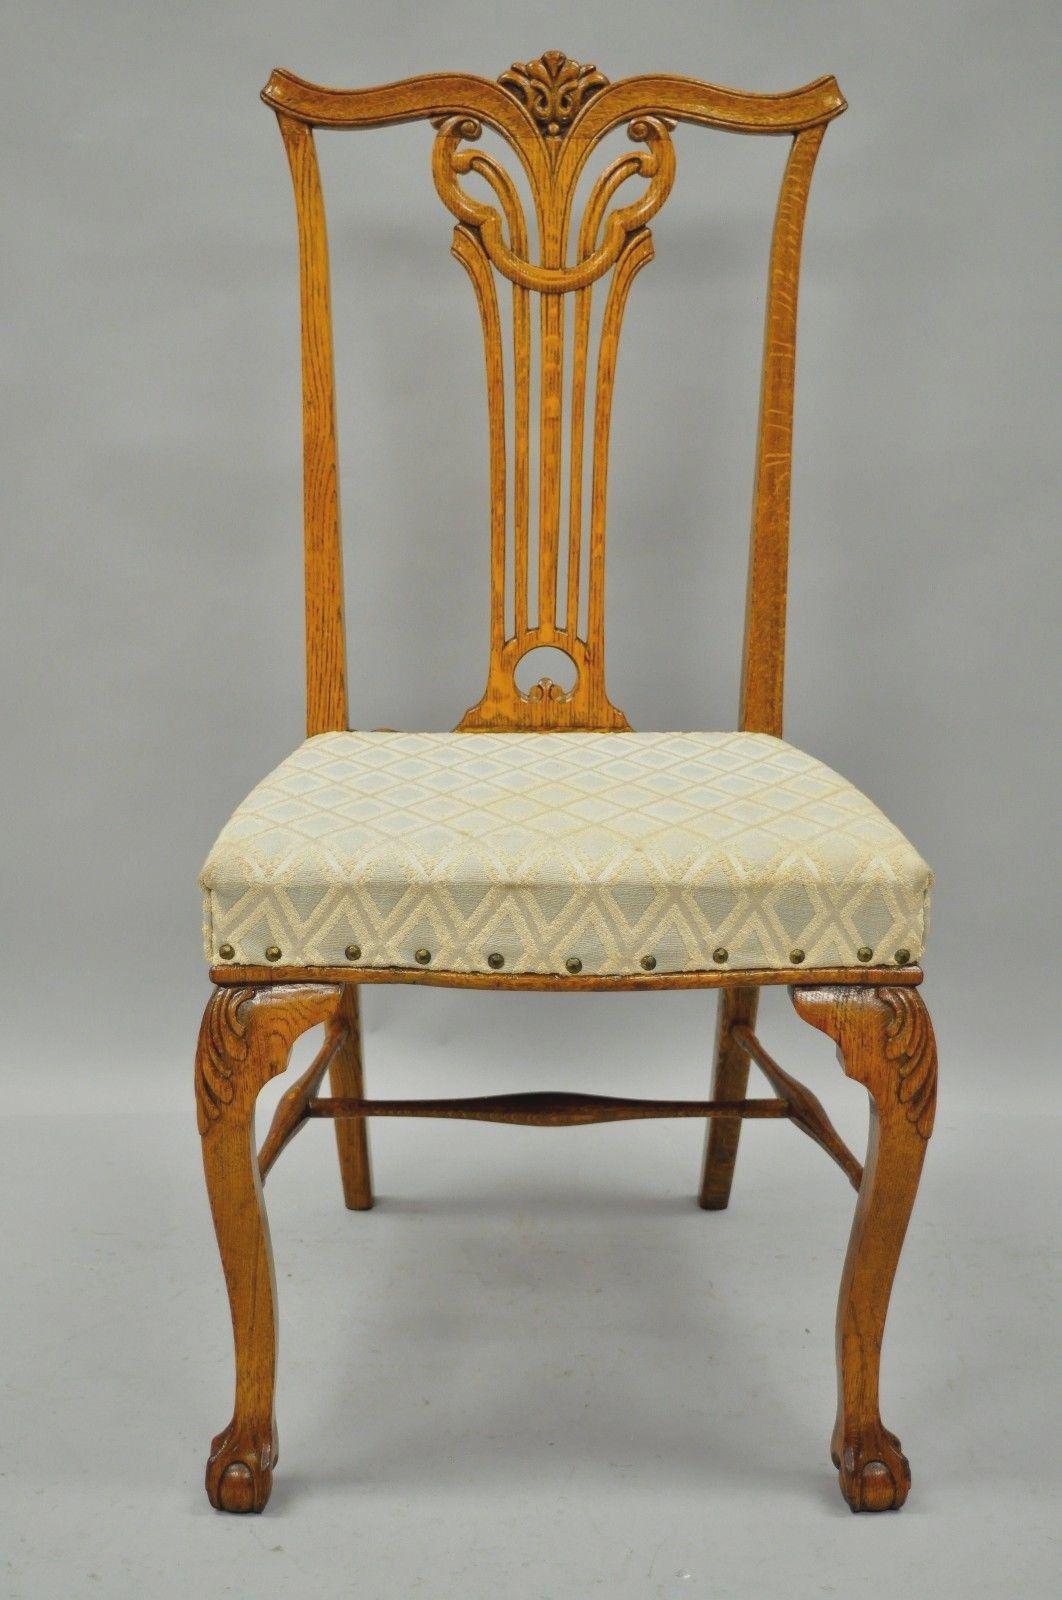 Ordinaire Item: Antique Golden Oak Victorian Chippendale Style Dining Side Chair  Details: Solid Oak Wood